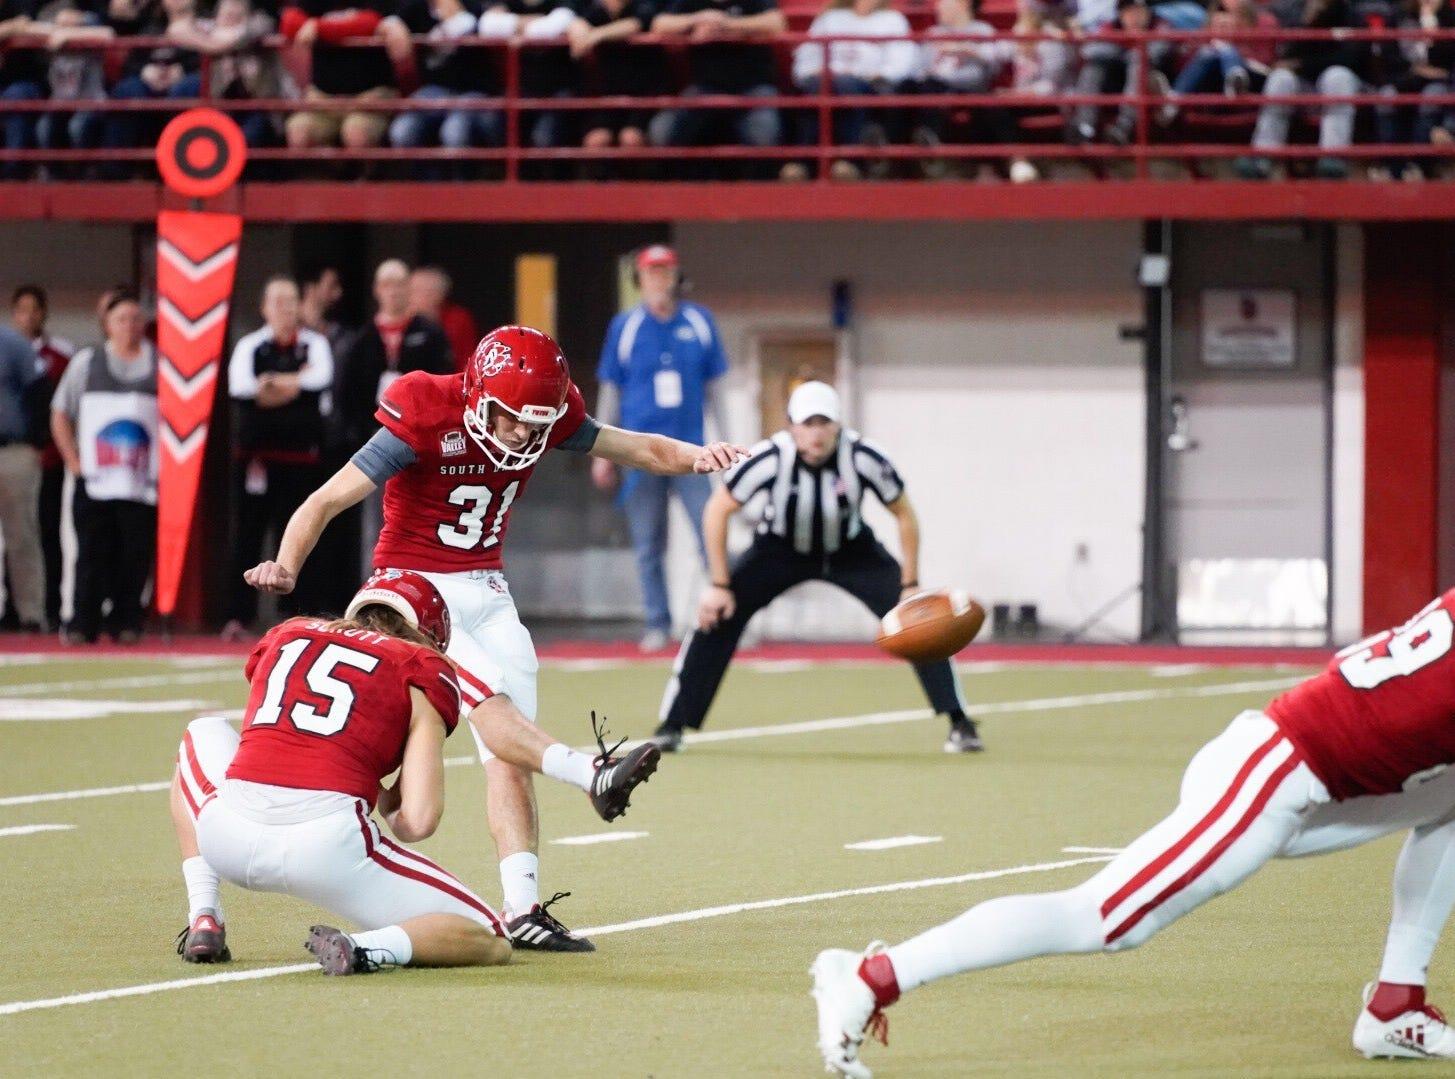 University of South Dakota kicker Mason Lorber attempts a field goal against Northern Iowa on Saturday in Vermillion.